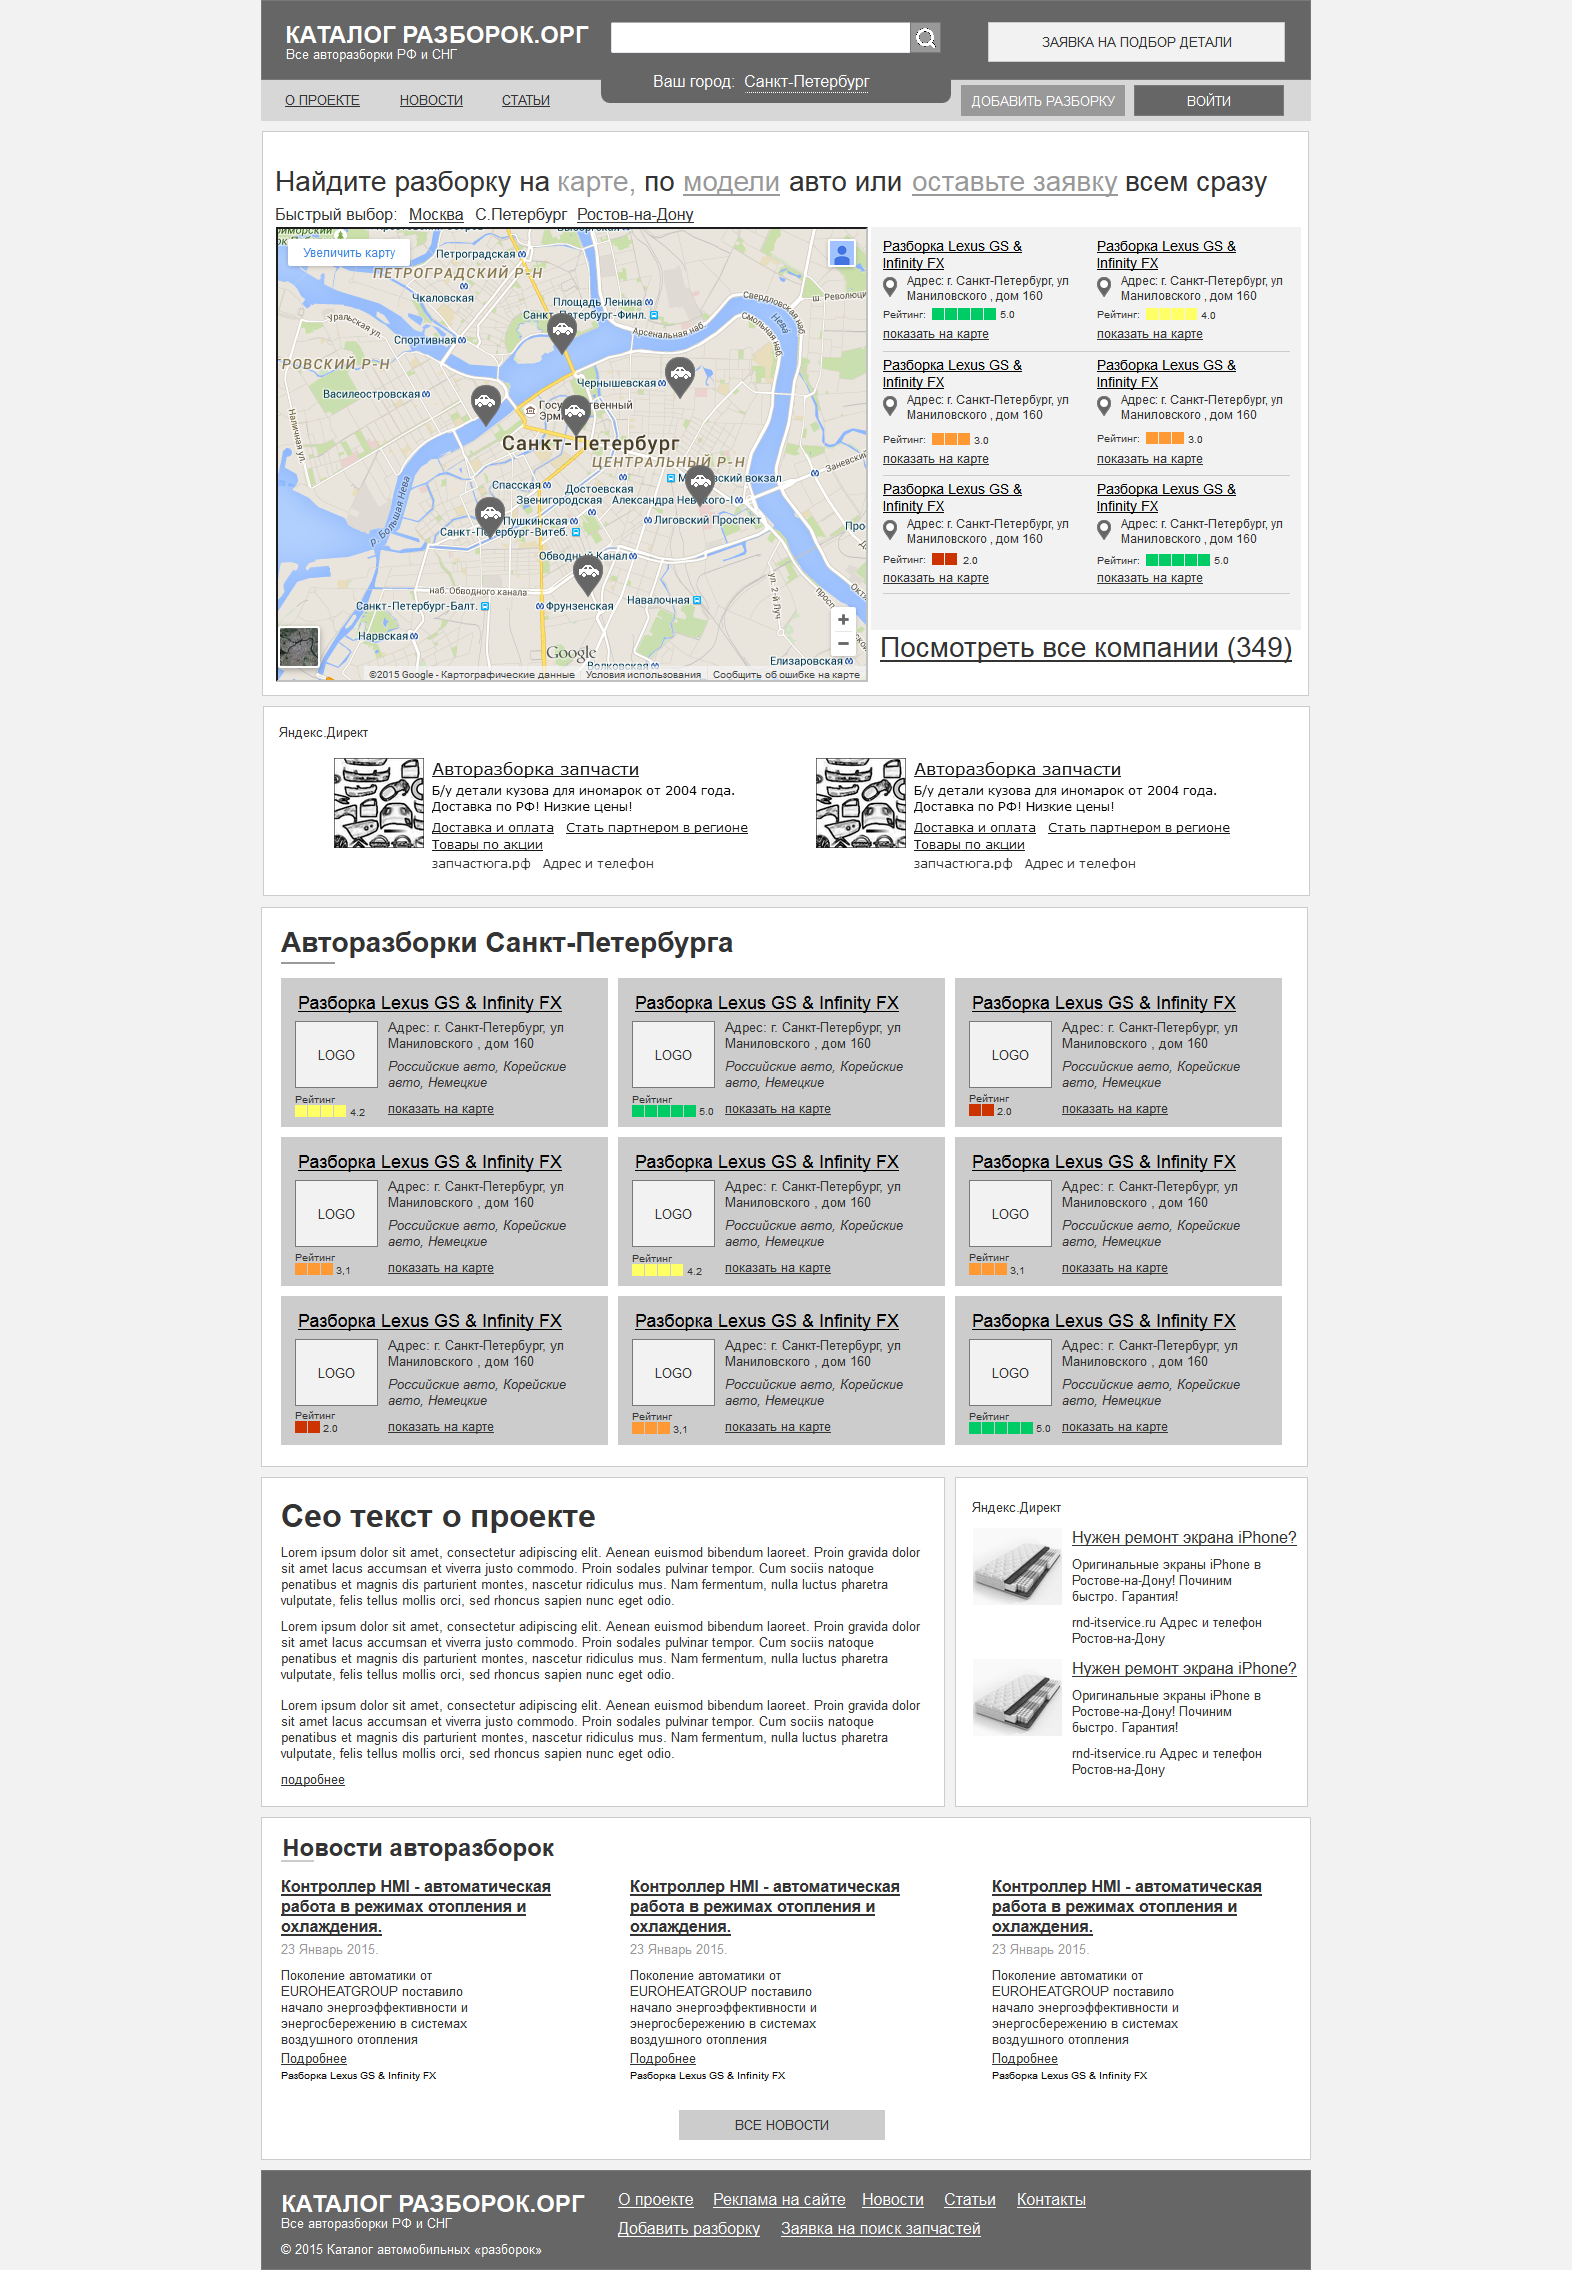 Полный прототип и ТЗ для сайта аналога http://avtorazborki.org/